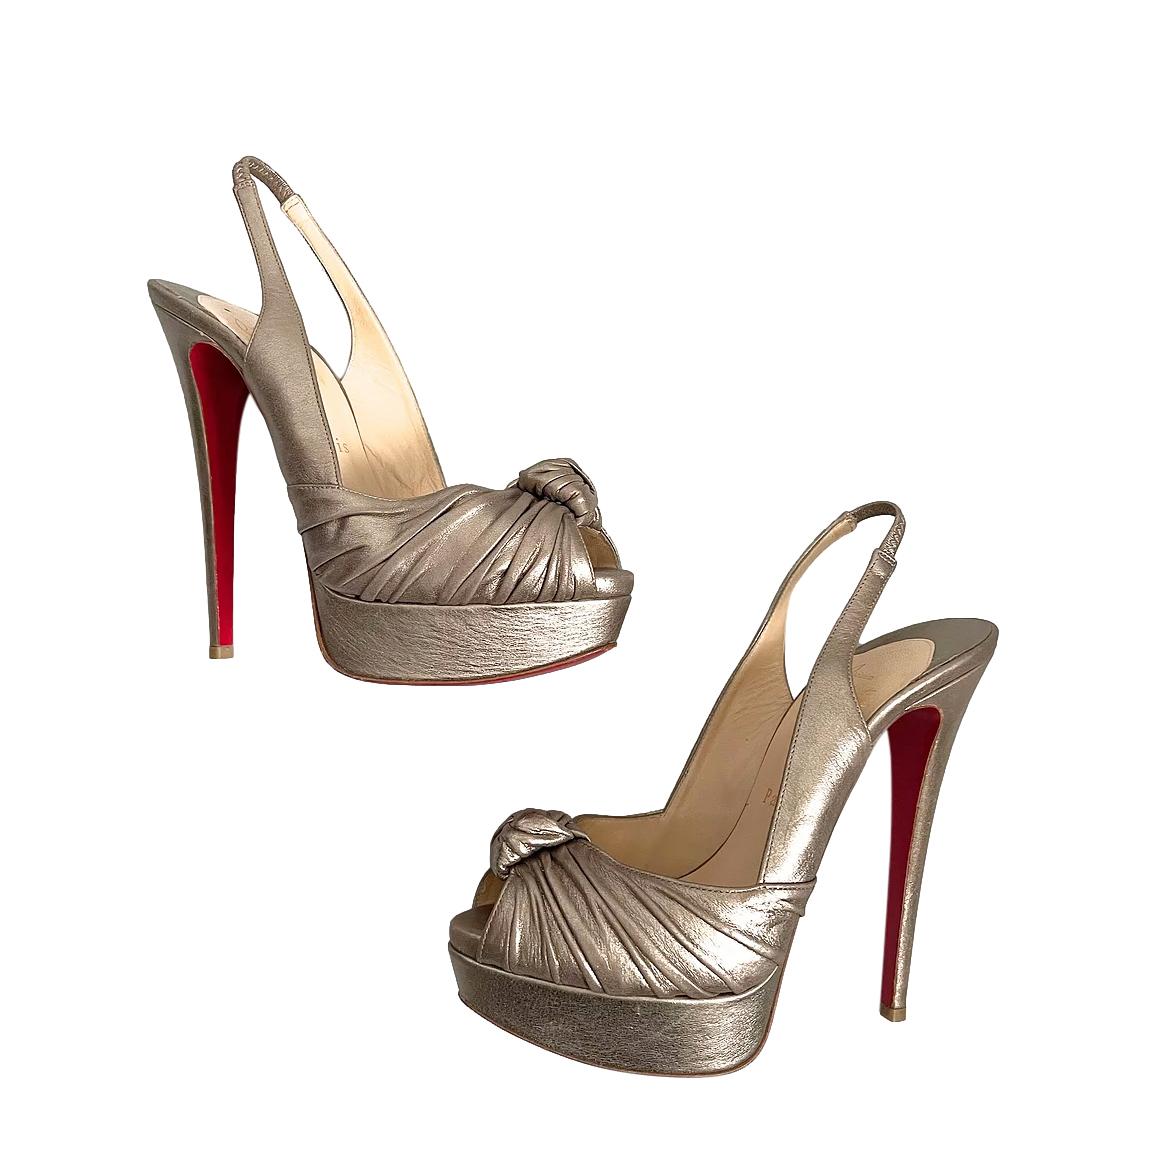 Christian Louboutin Metallic Knotted Peep Toe Pumps